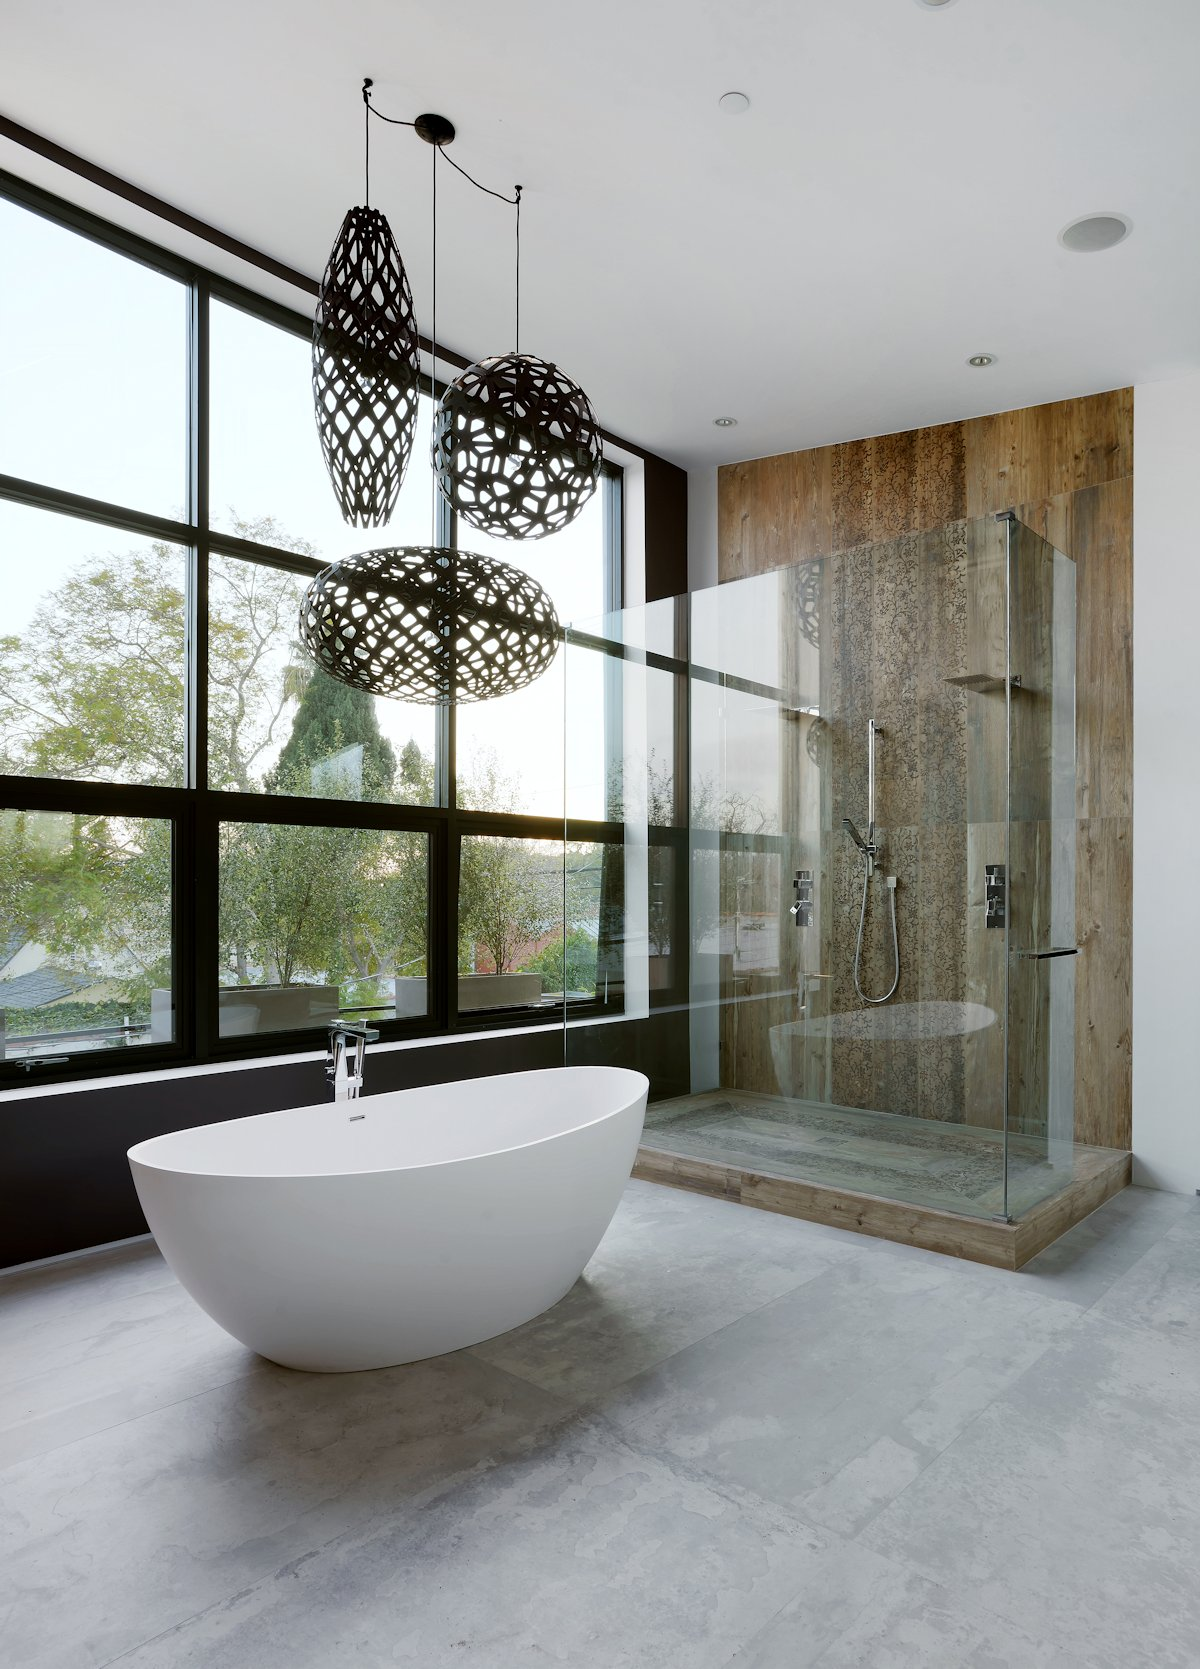 Concrete Floor Bathtub with Chandelier